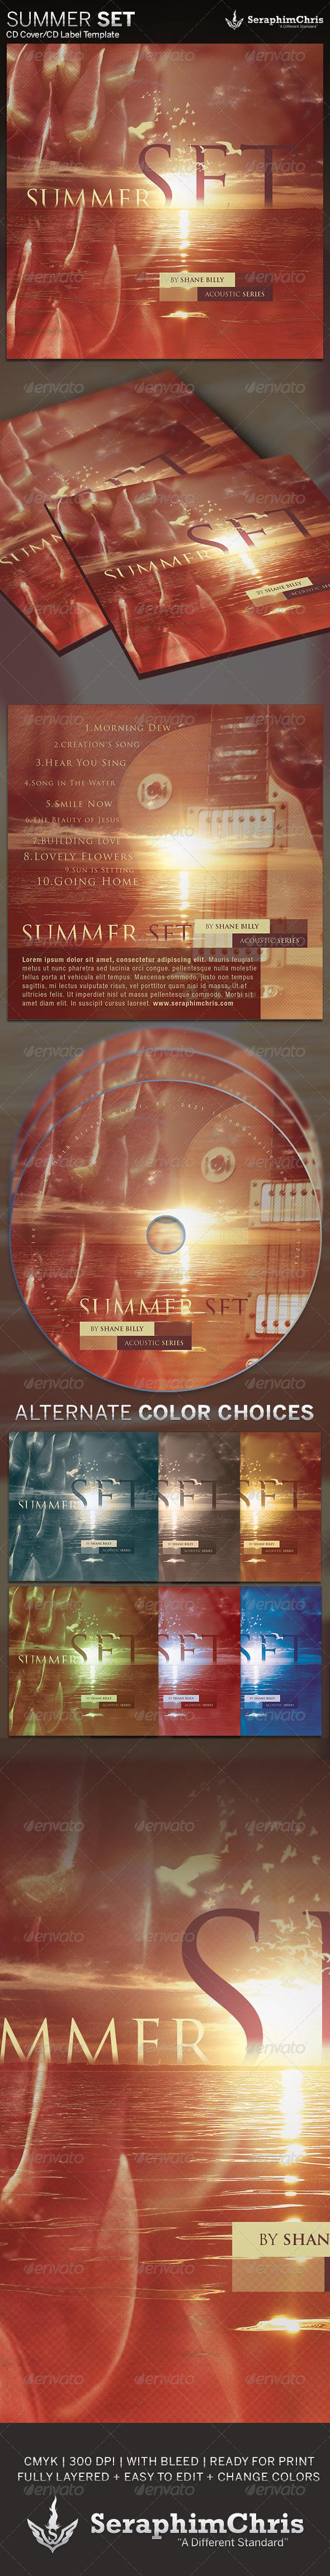 Summer Set: CD Cover Artwork Template - CD & DVD Artwork Print Templates